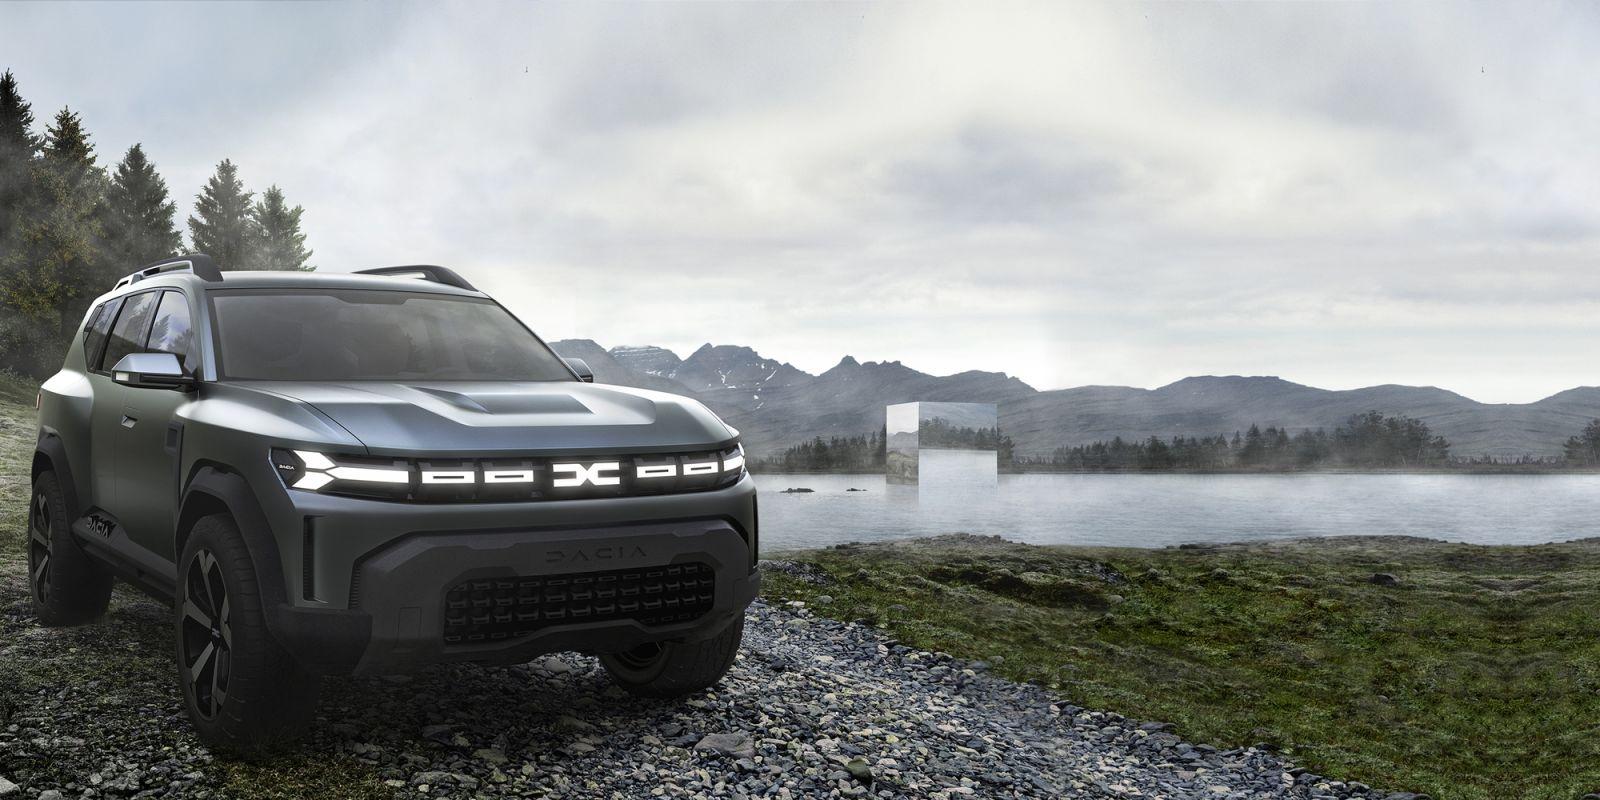 Dacia a prezentat Bigster, conceptul unui model SUV de 4,6 metri lungime